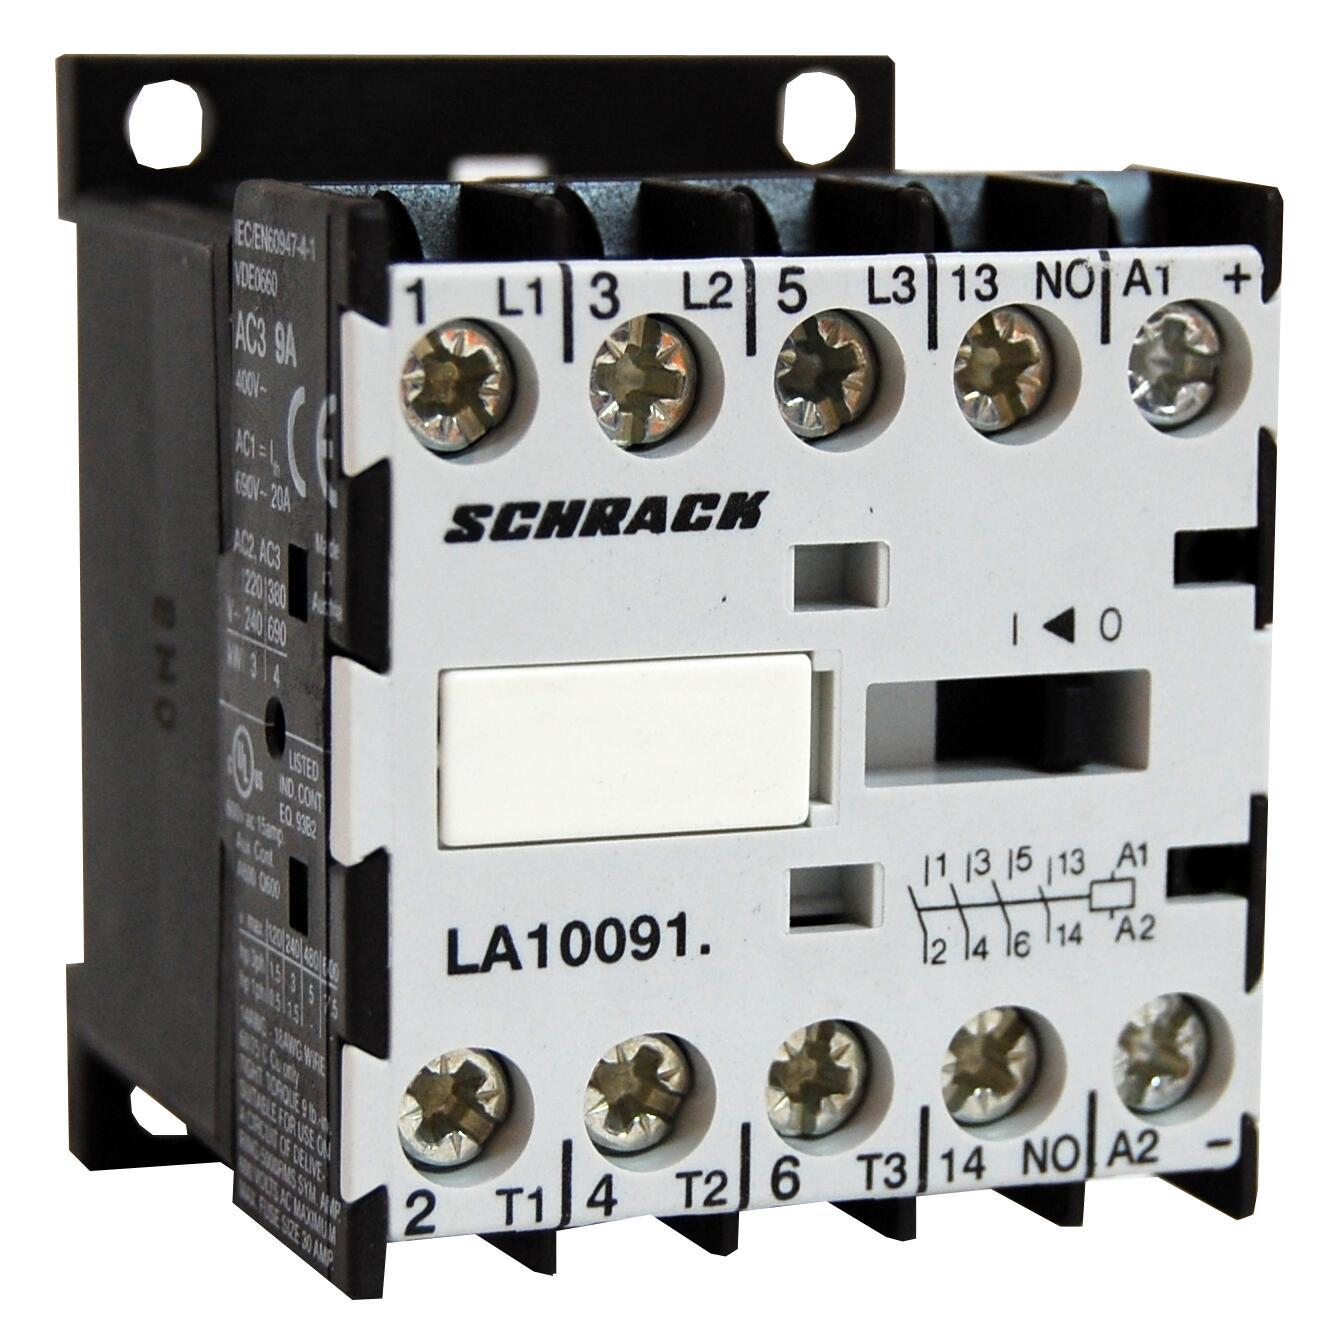 LA100915 - Schrack Technik